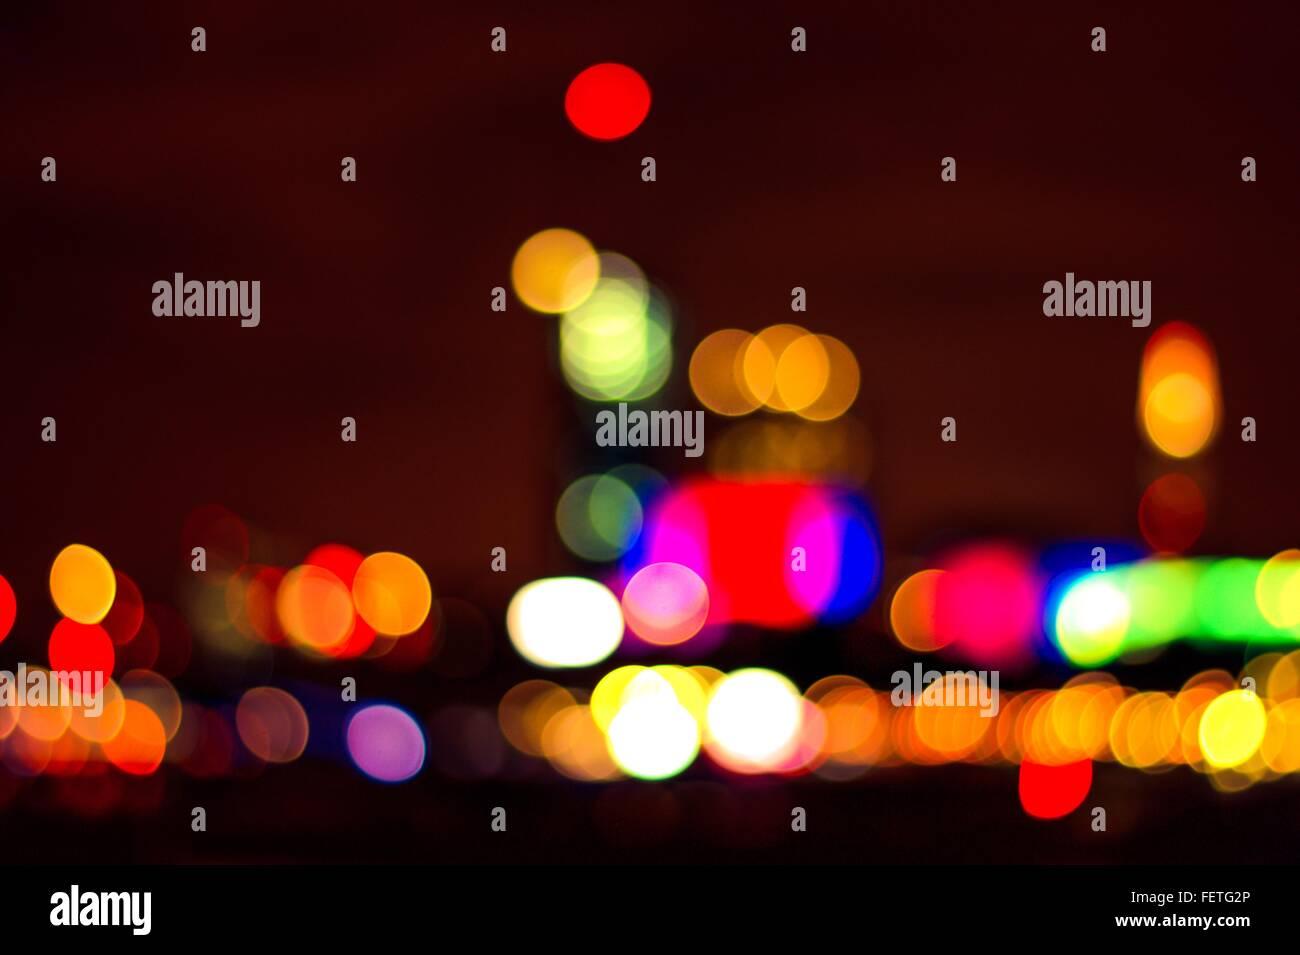 Multi Colored Lights - Stock Image